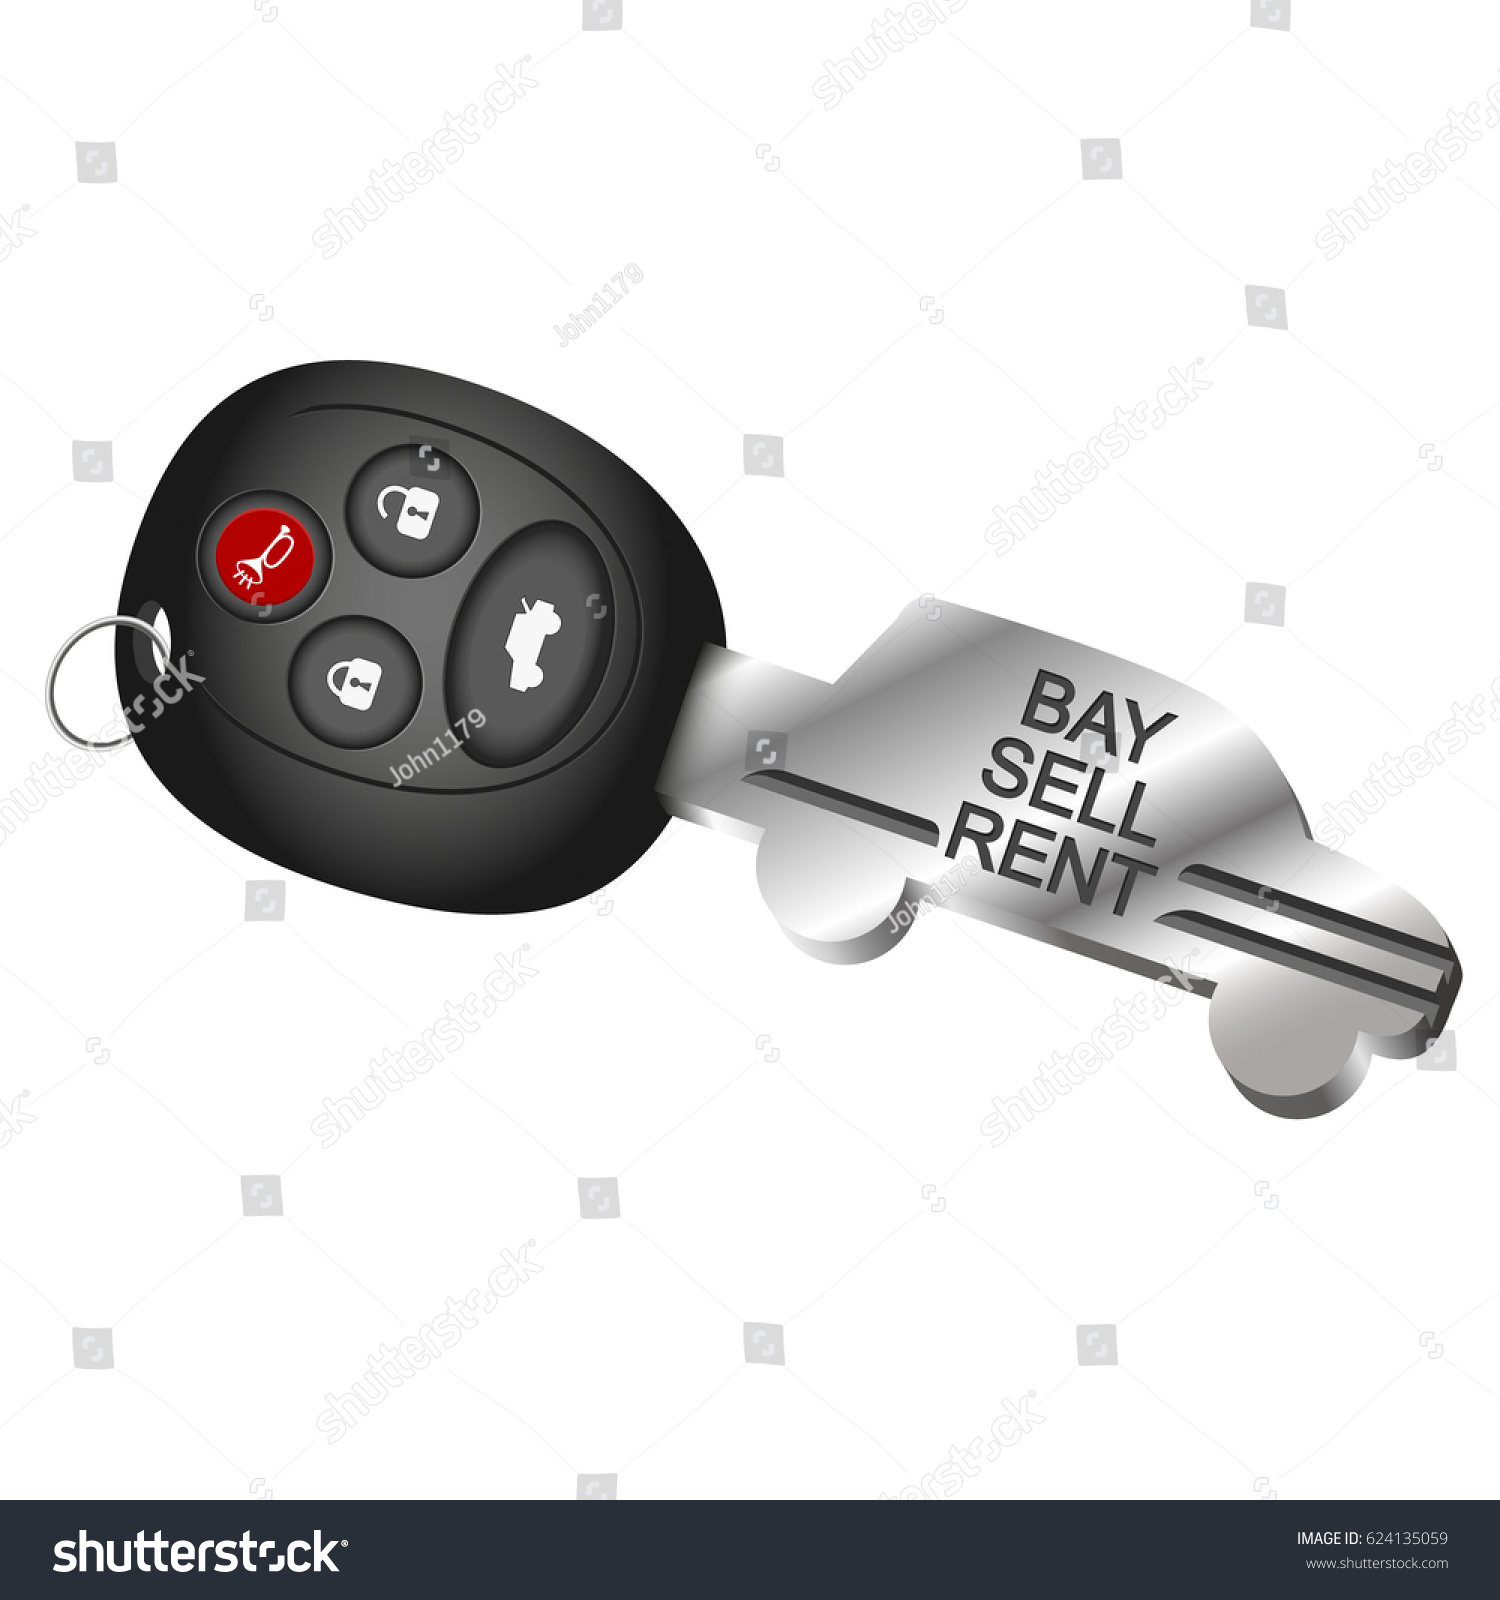 Symbol car key rental sale purchase stock vector 624135059 the symbol of a car key for the rental sale and purchase of cars biocorpaavc Choice Image